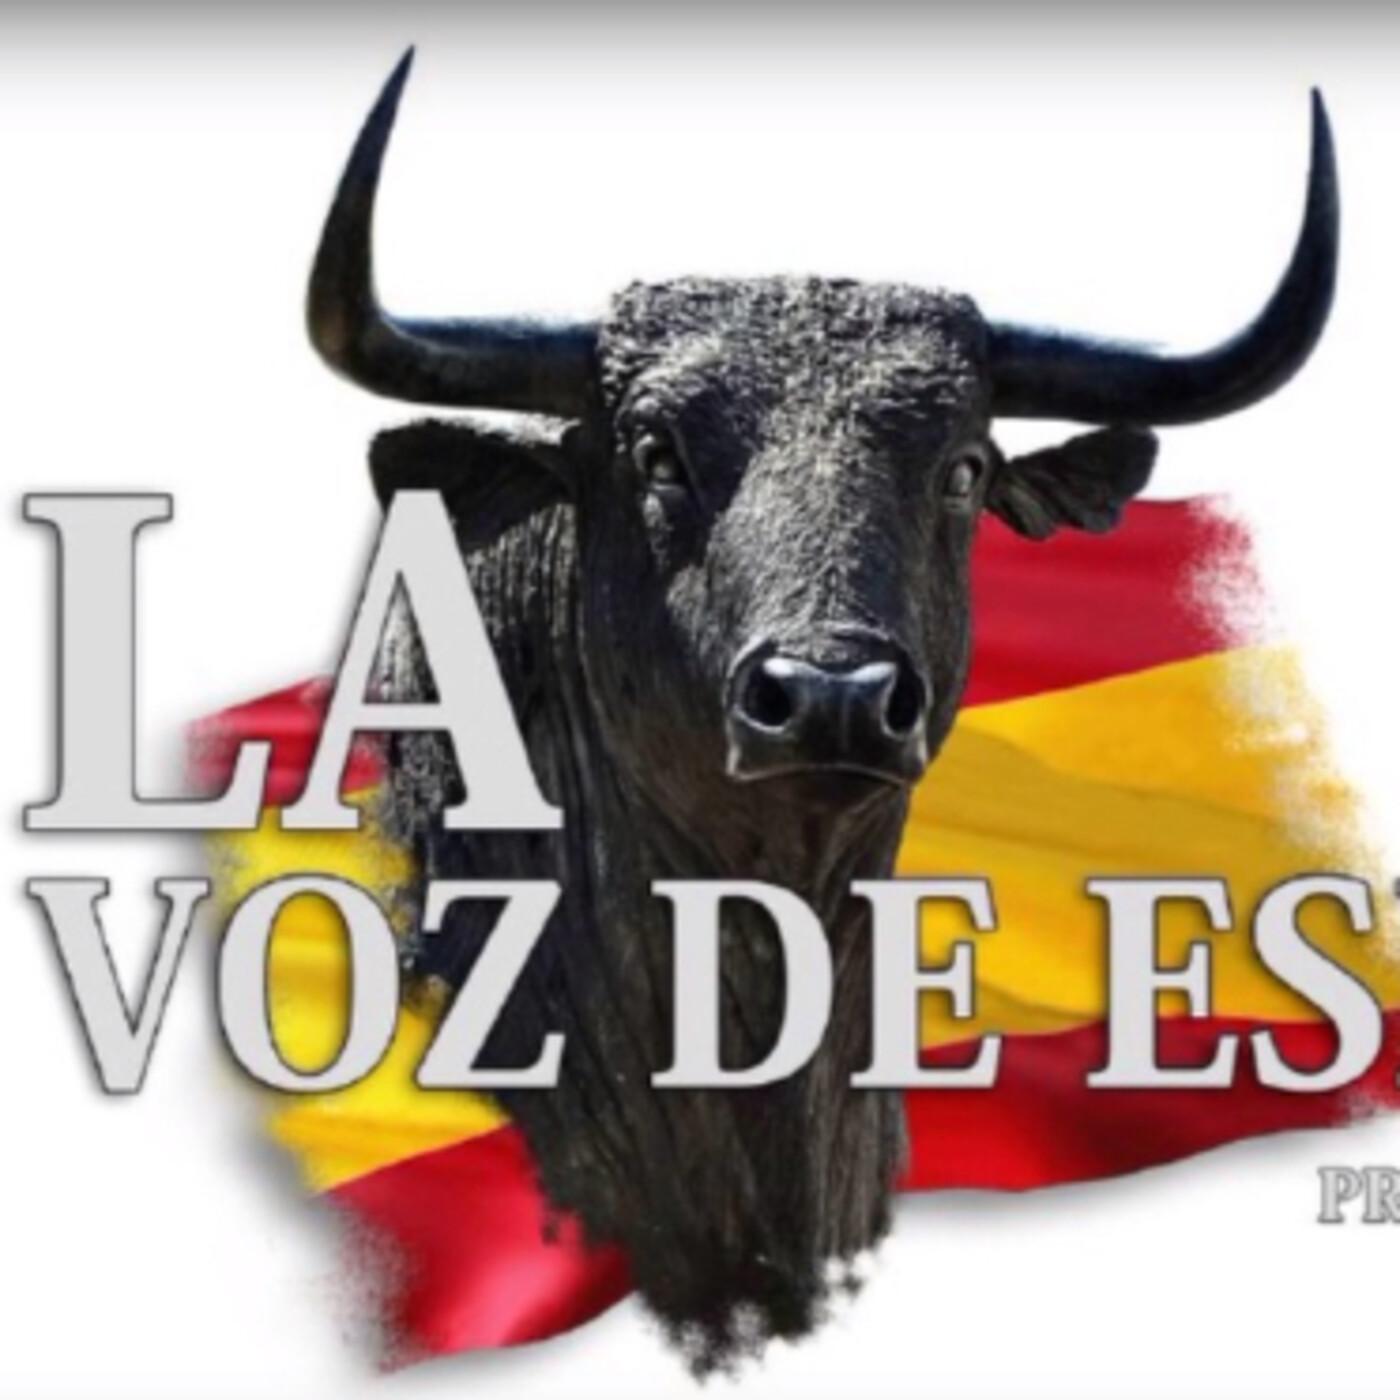 LA VOZ DE ESPAÑA Ed: 243 (10 de Junio)